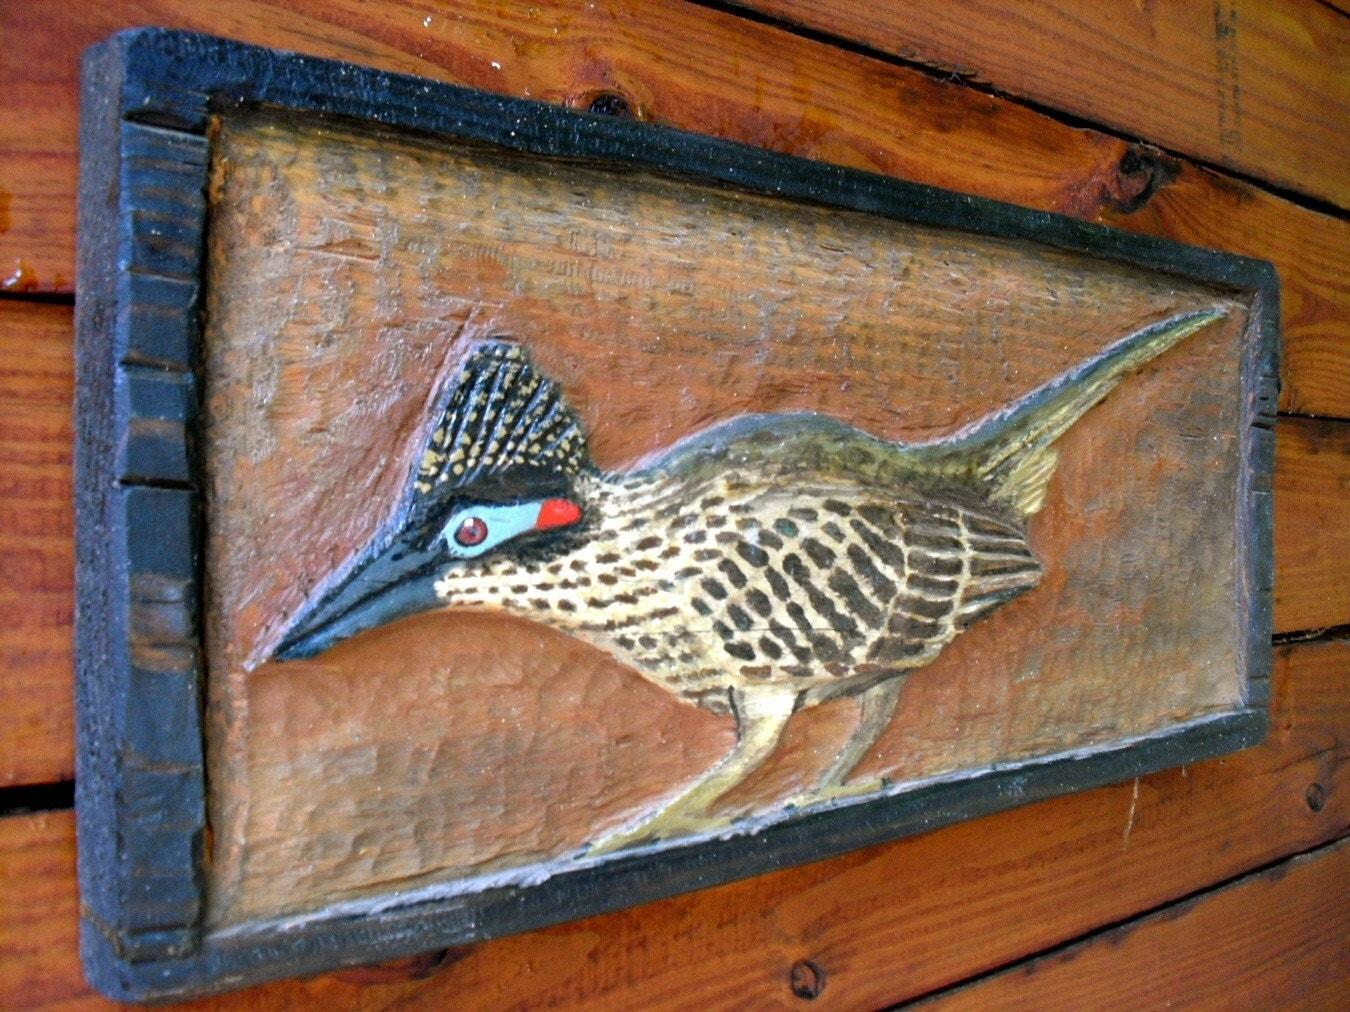 Road runner chainsaw wood desert carving detailed